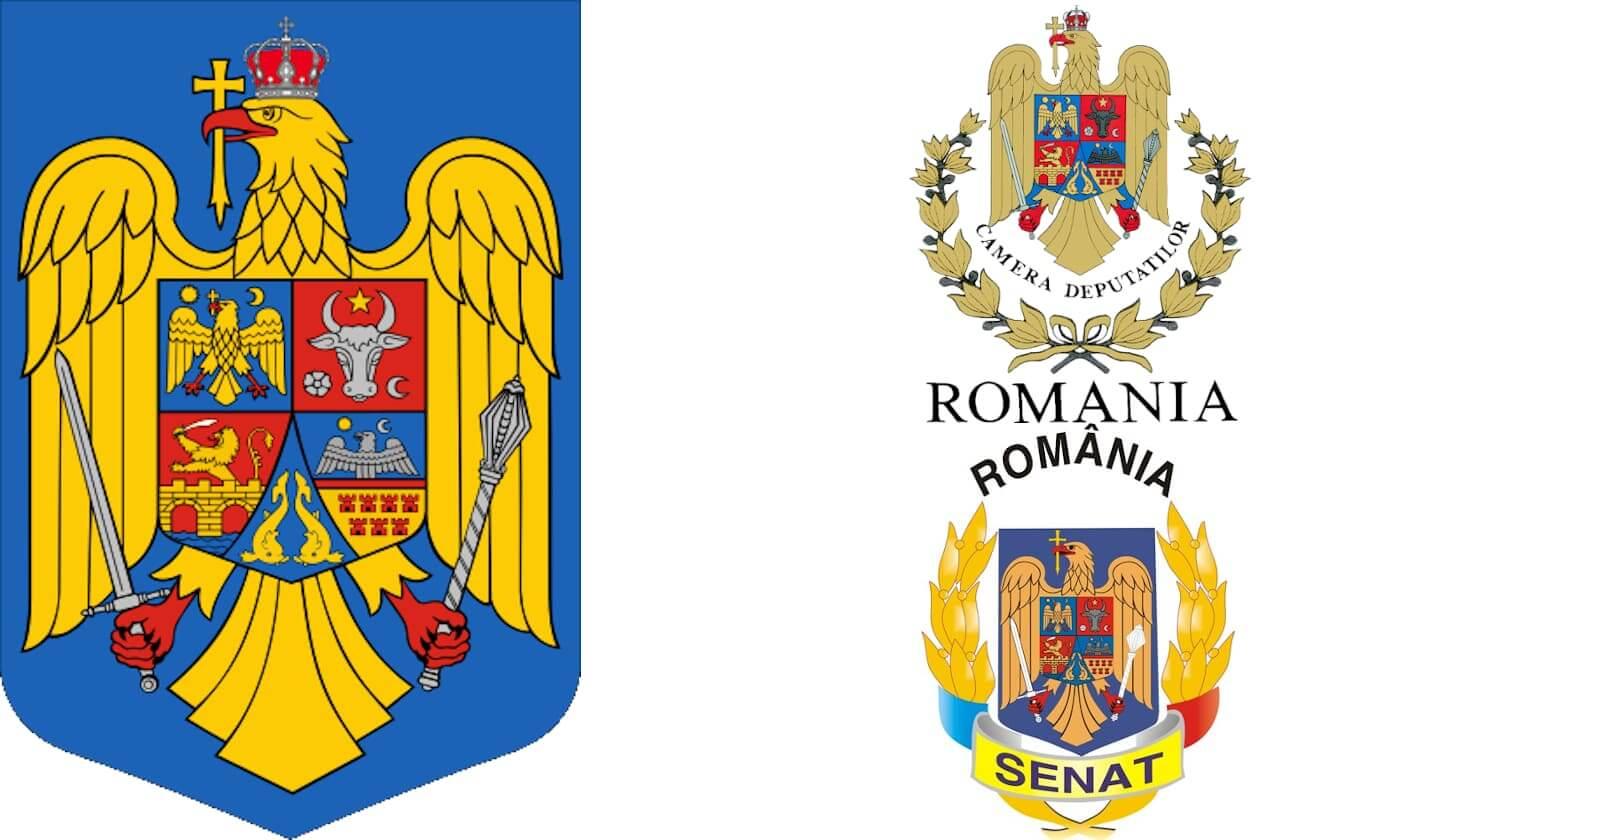 https://ziarul.romania-rationala.ro/control/articole/articole/parlamentul-romaniei-banner_2.jpg